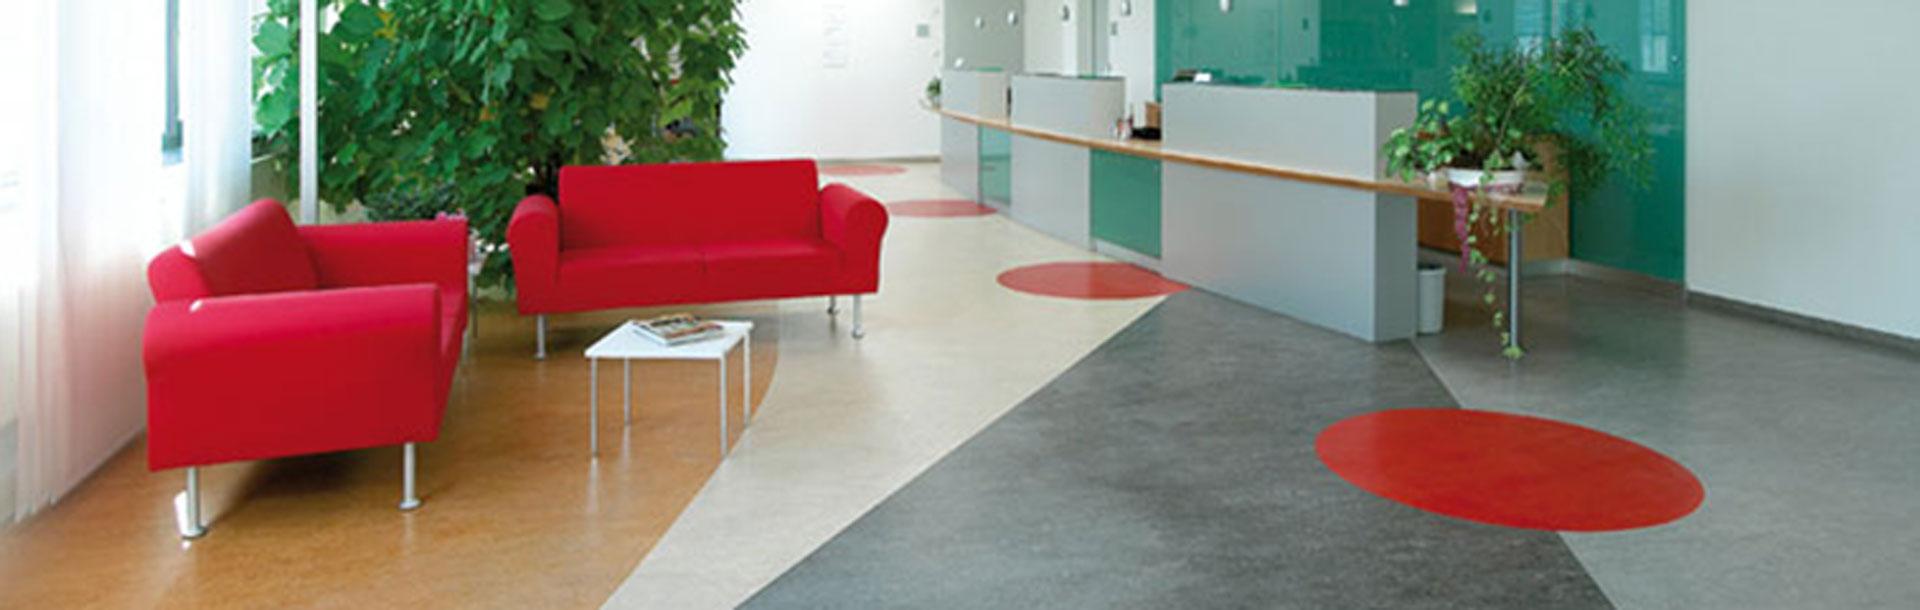 linoleumboden düsseldorf